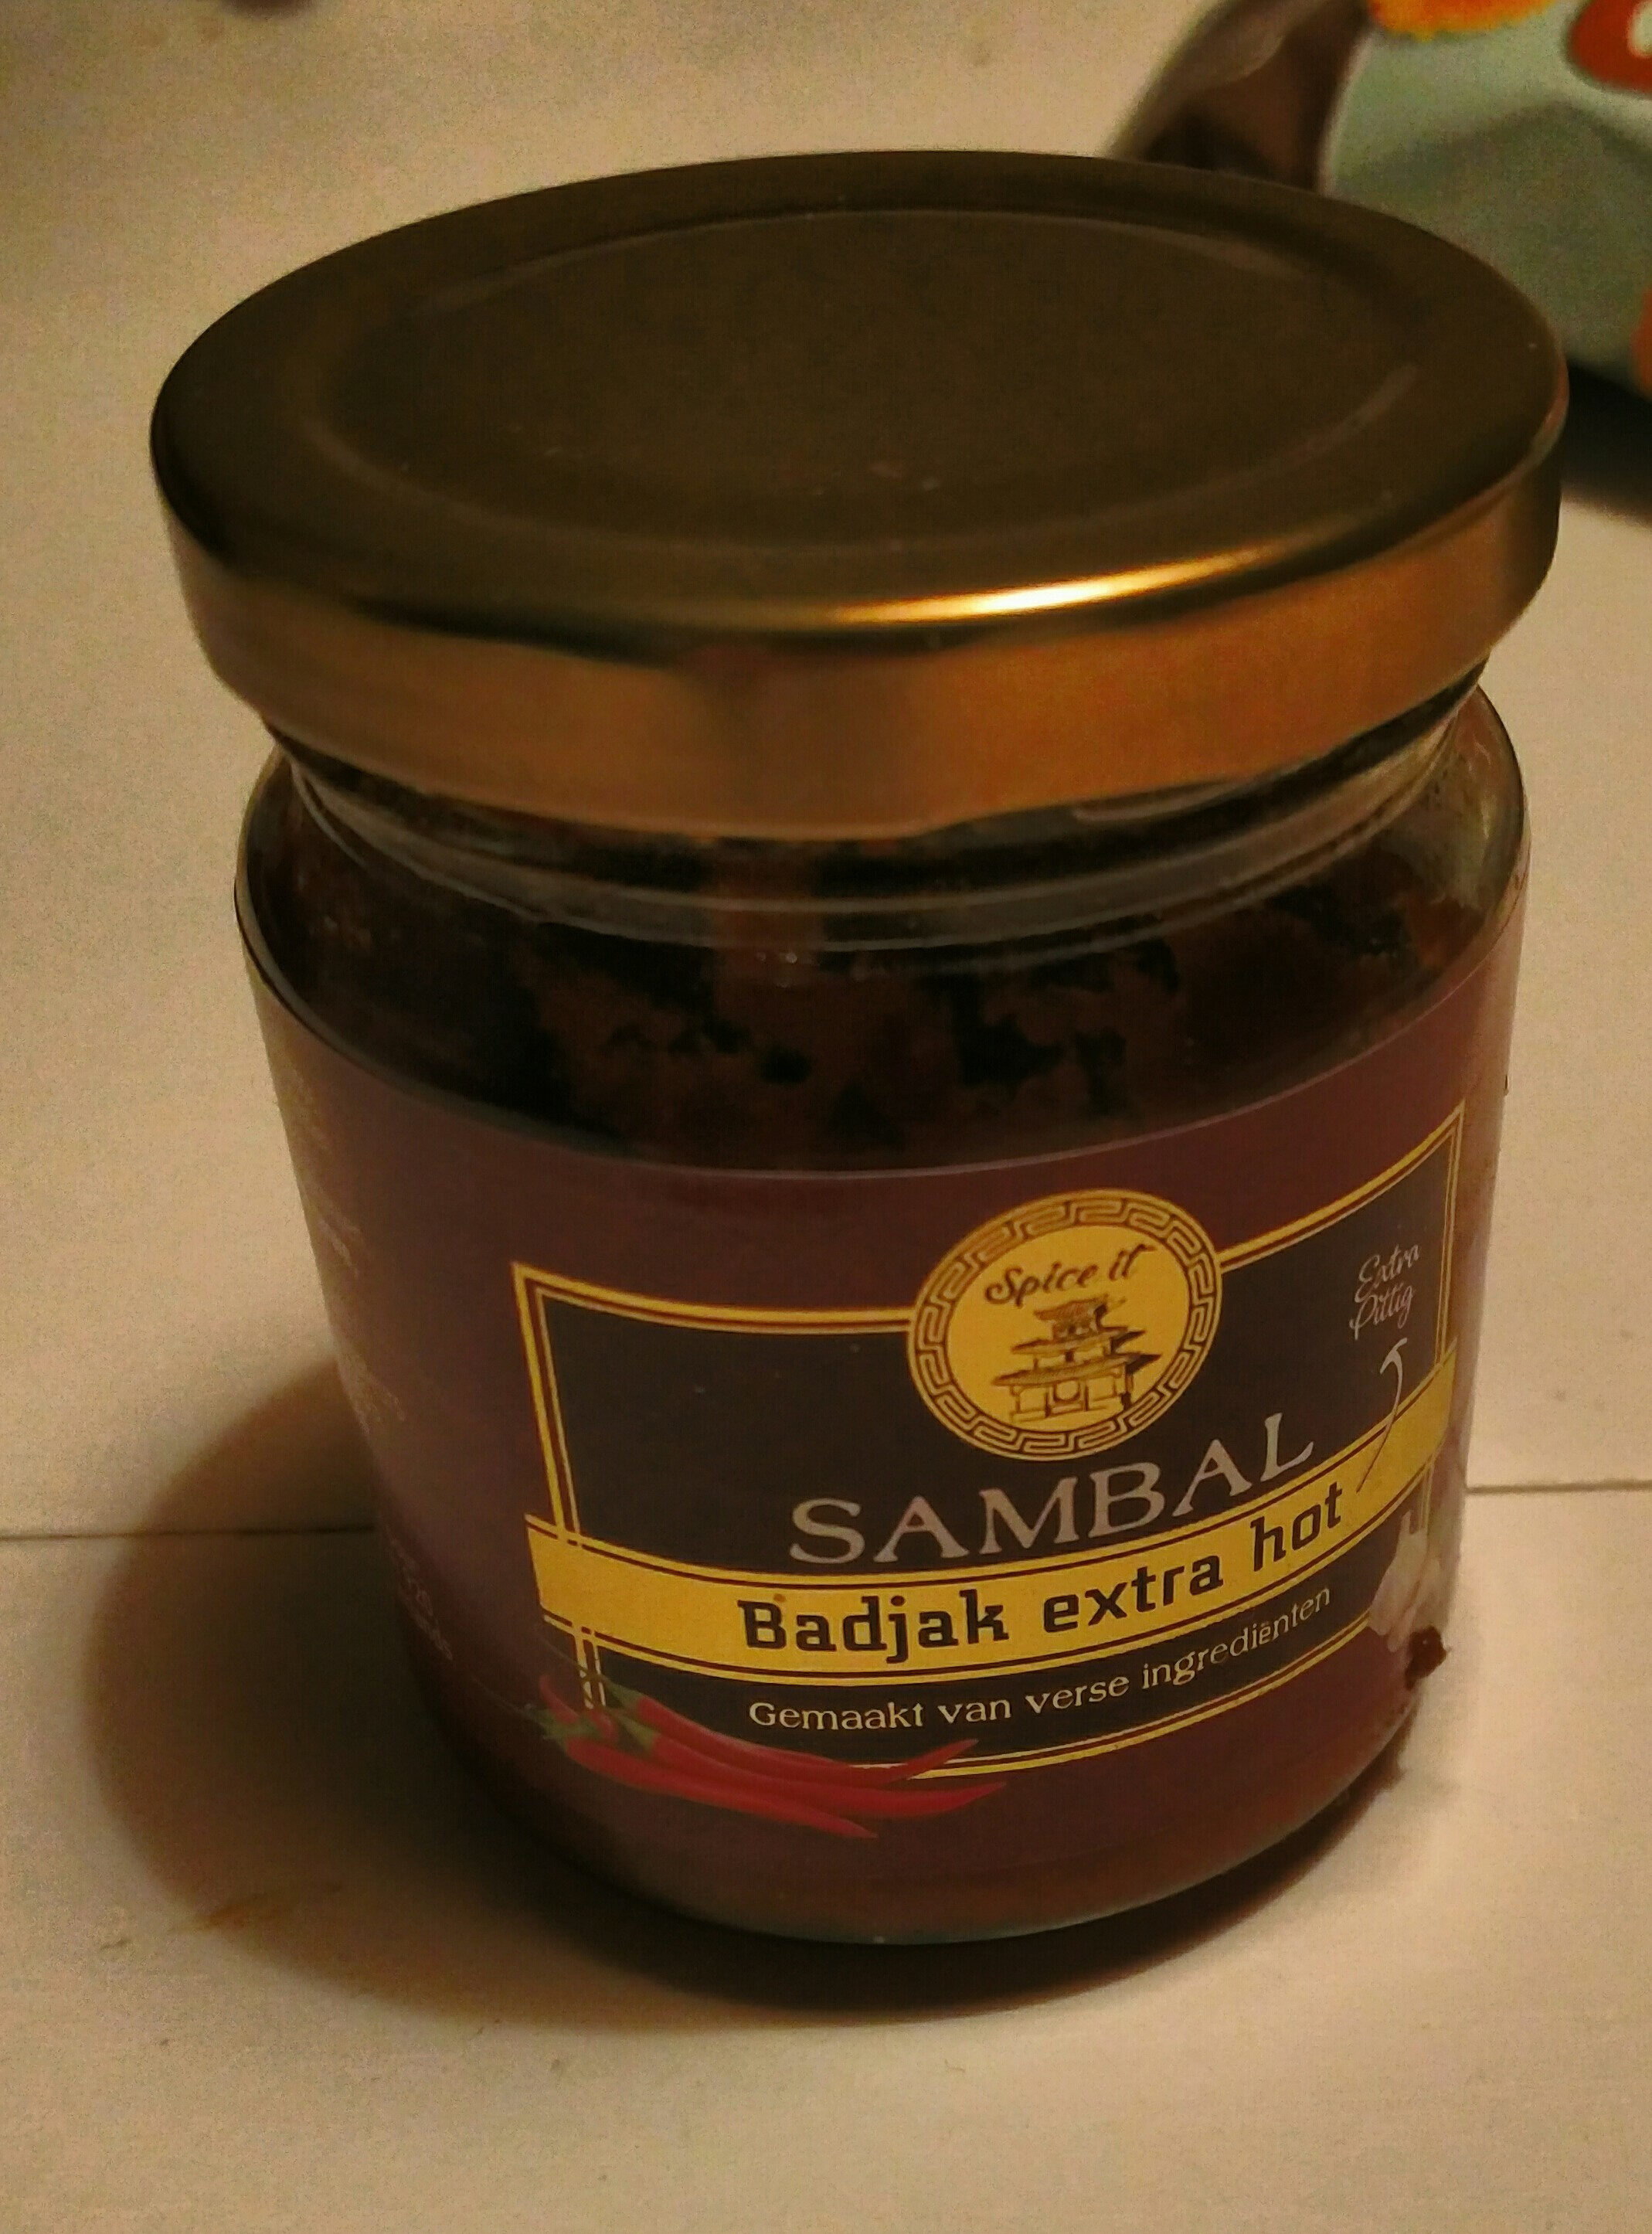 Sambal badjak extra hot - Product - nl